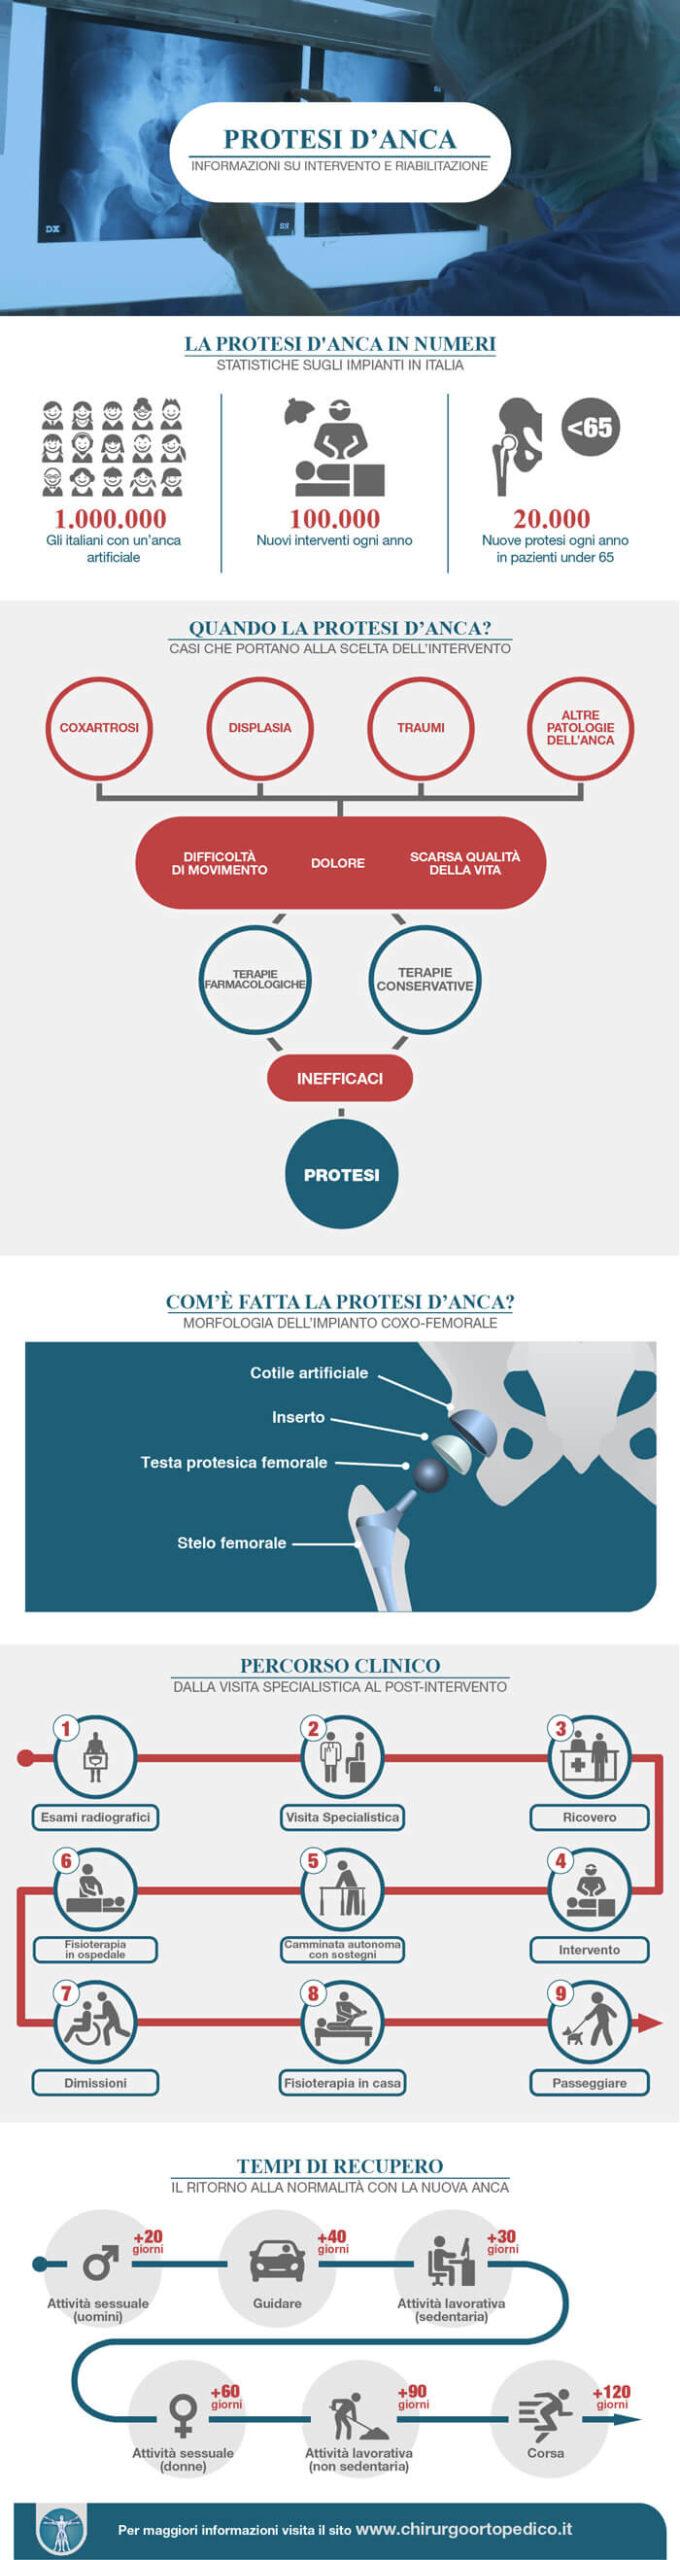 Protesi_anca_infografica